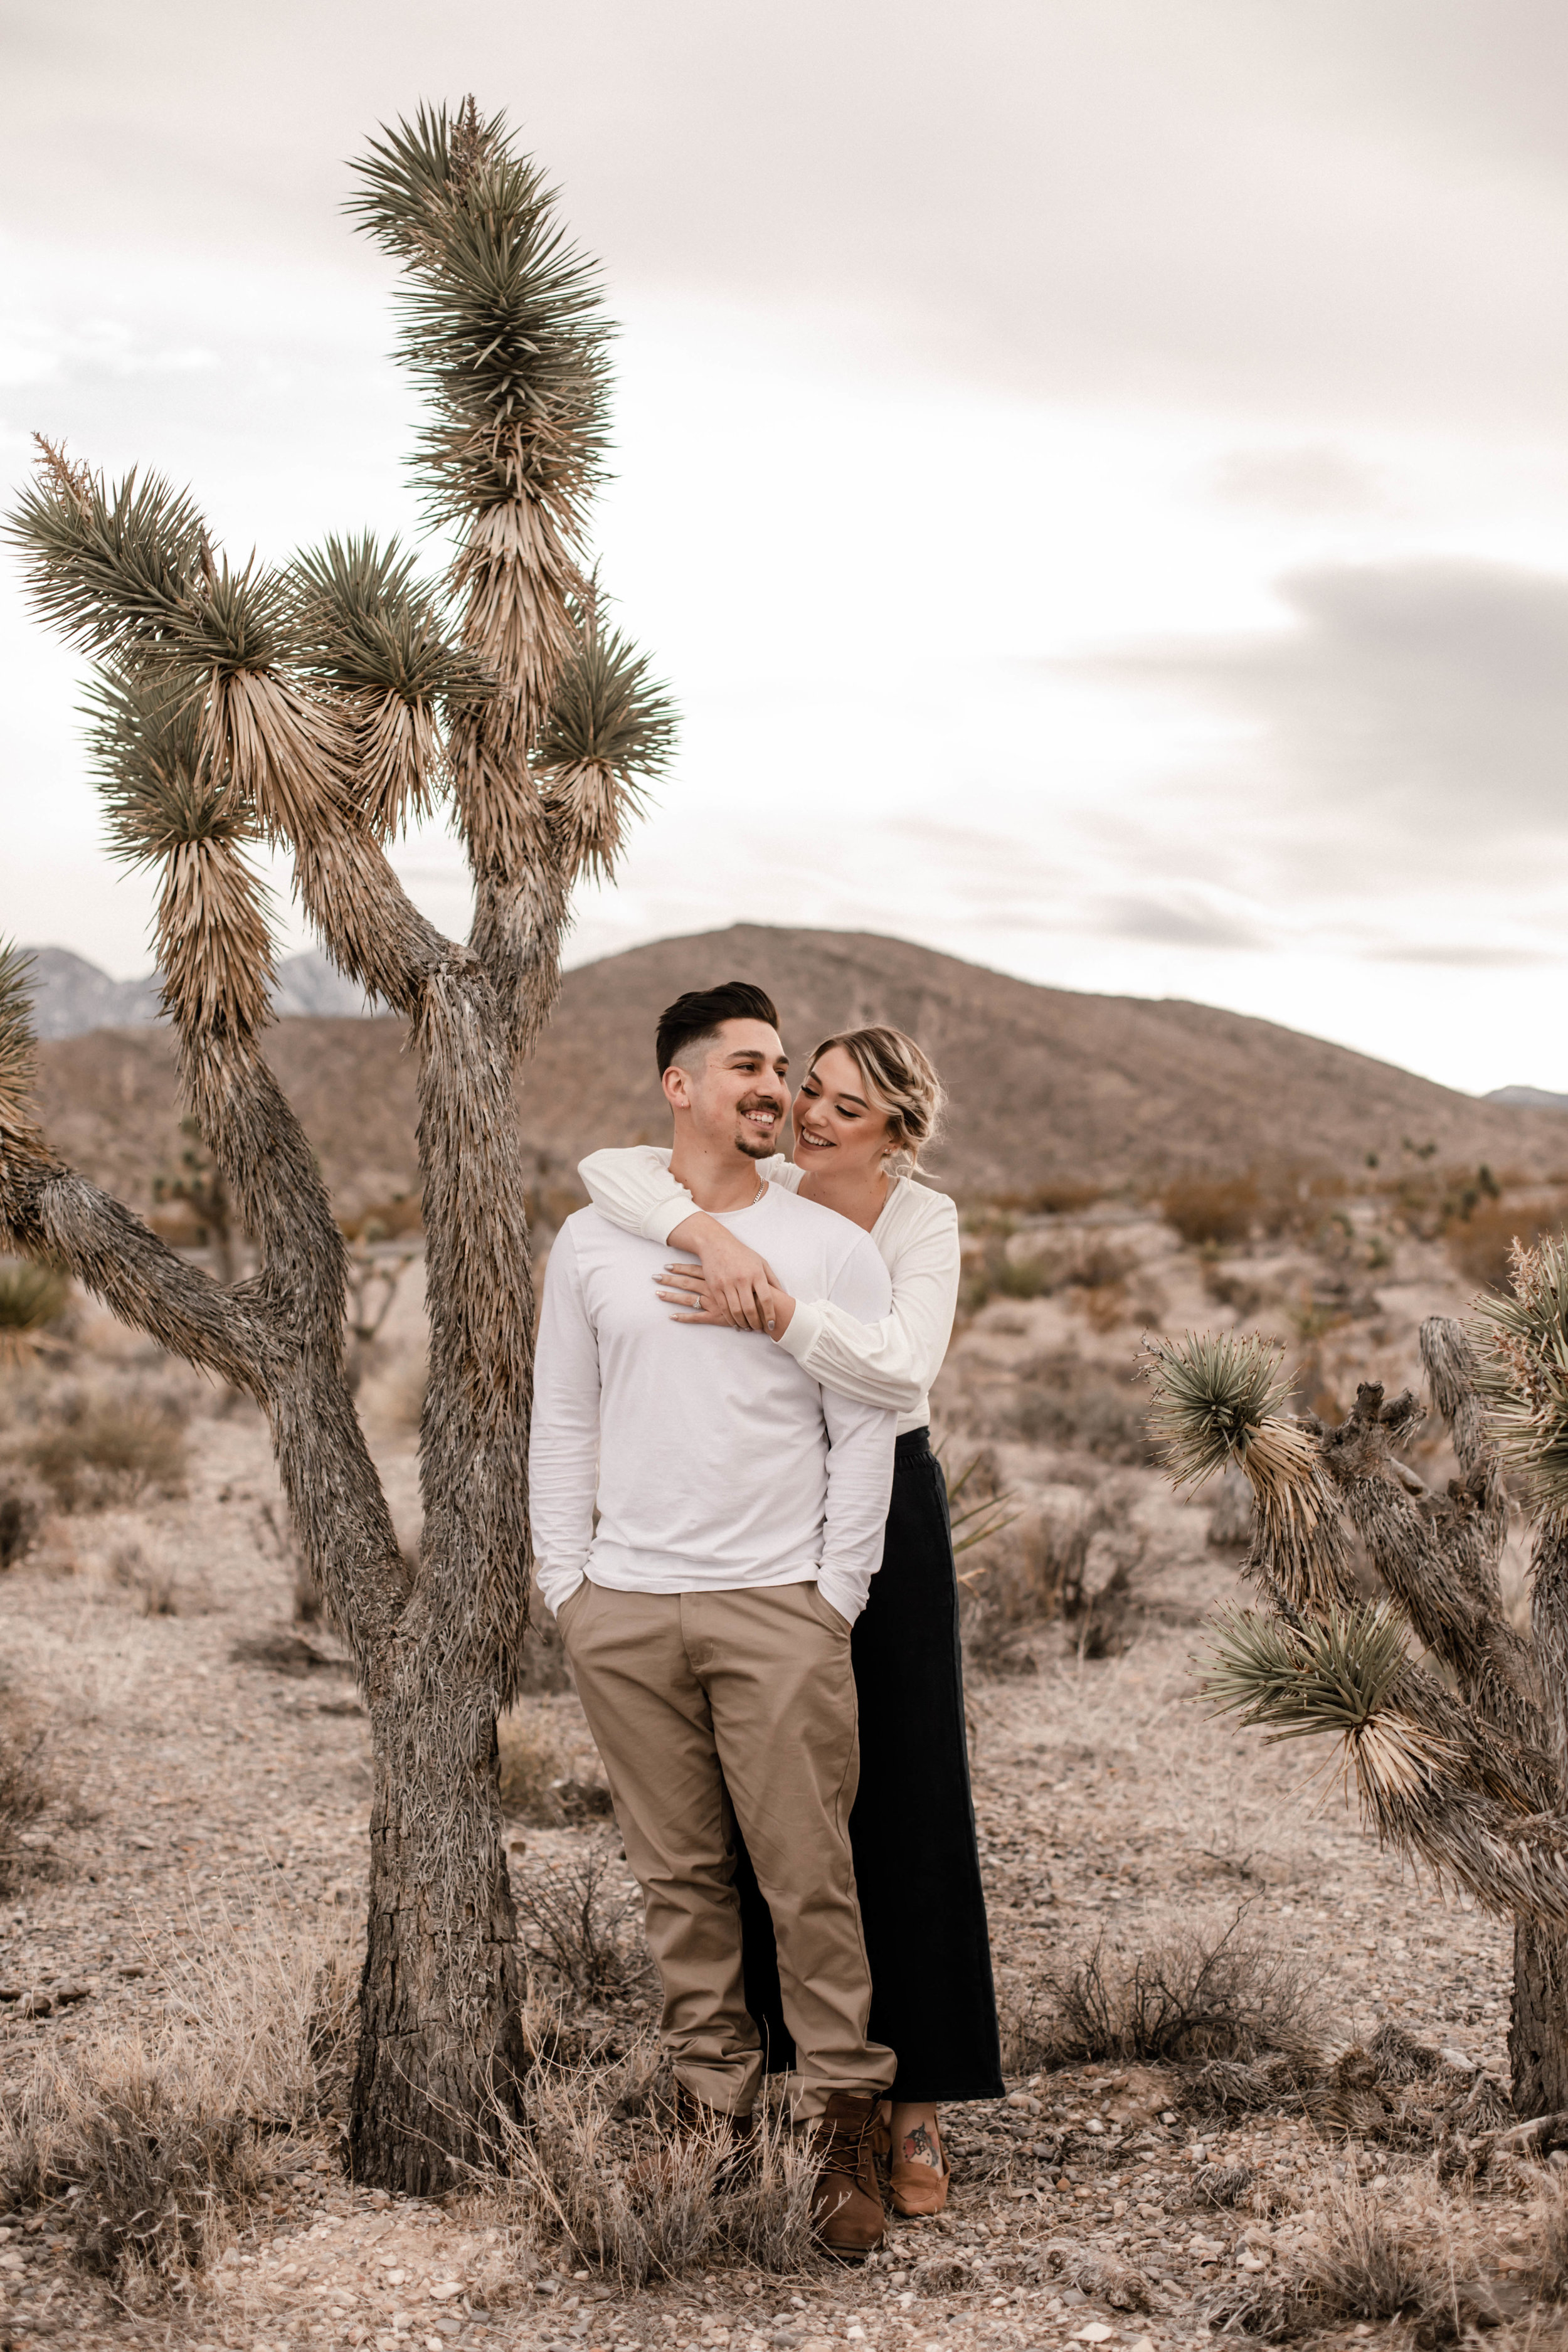 Madison + Craig   Ashlyn Savannah Photo   Las Vegas, NV-9.jpg